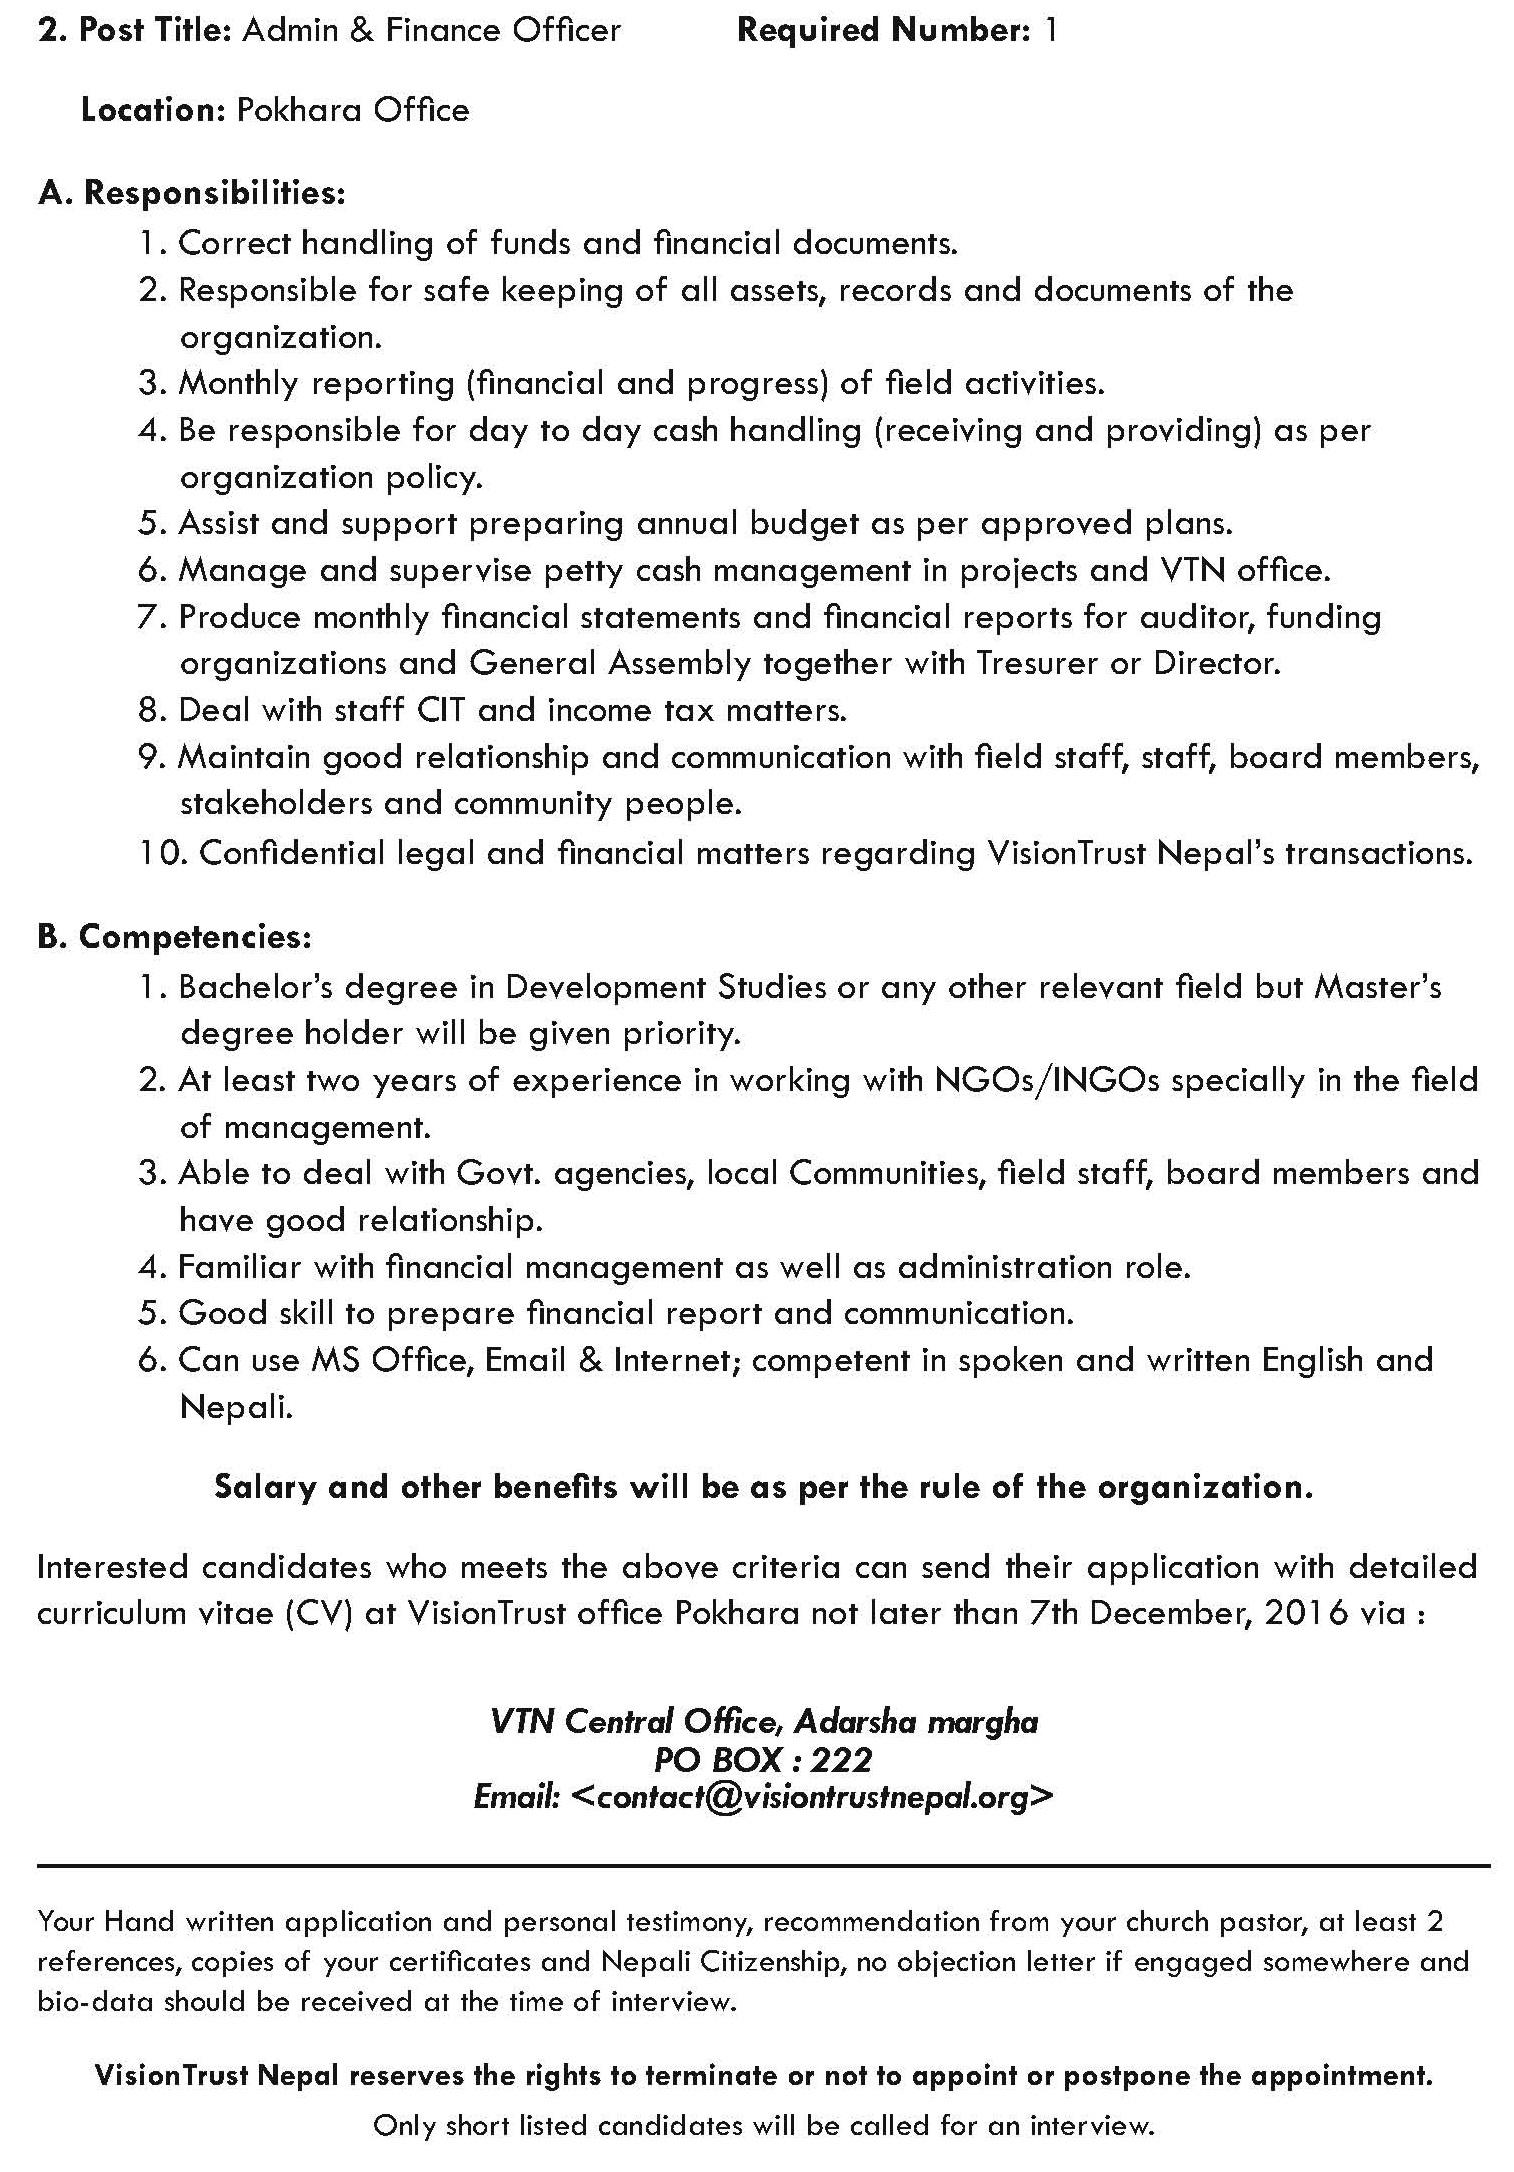 vacancy-page_2